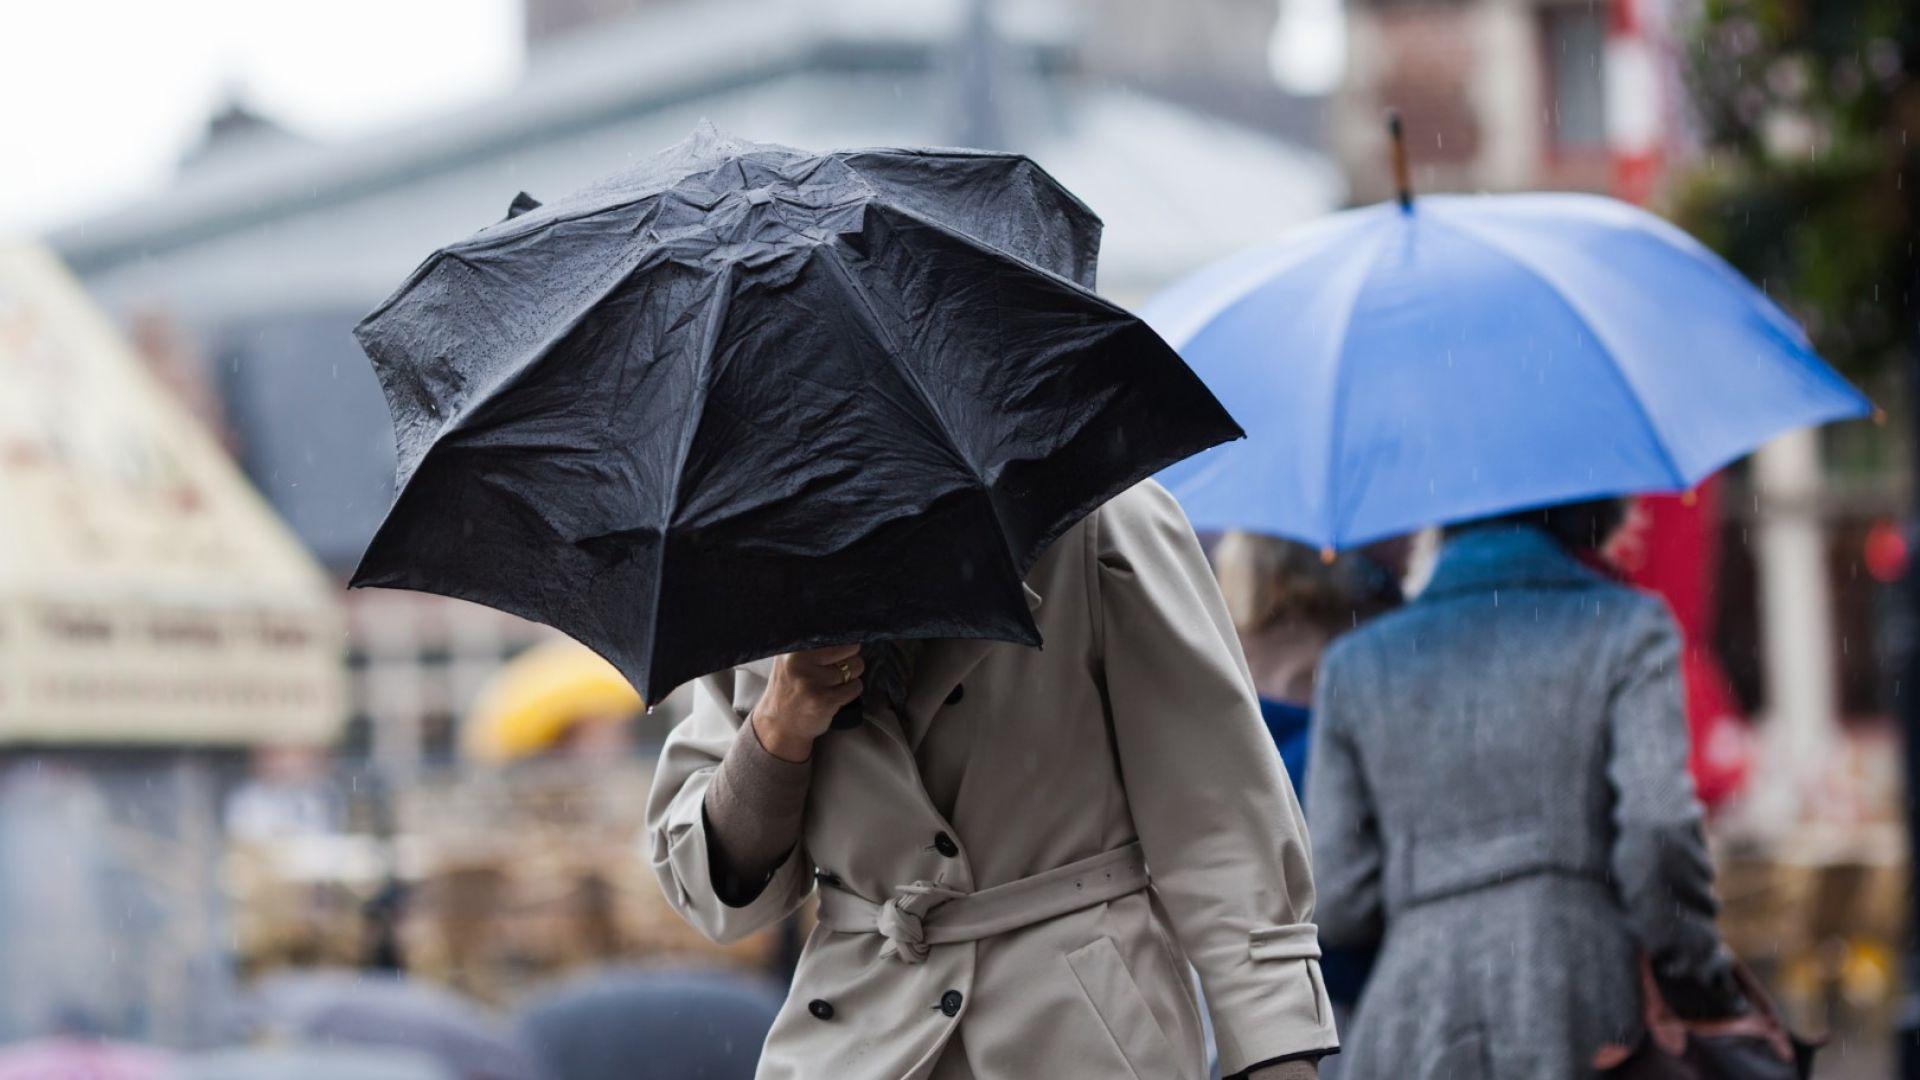 Променливо време през седмицата - дъжд, сняг и мартенски температури